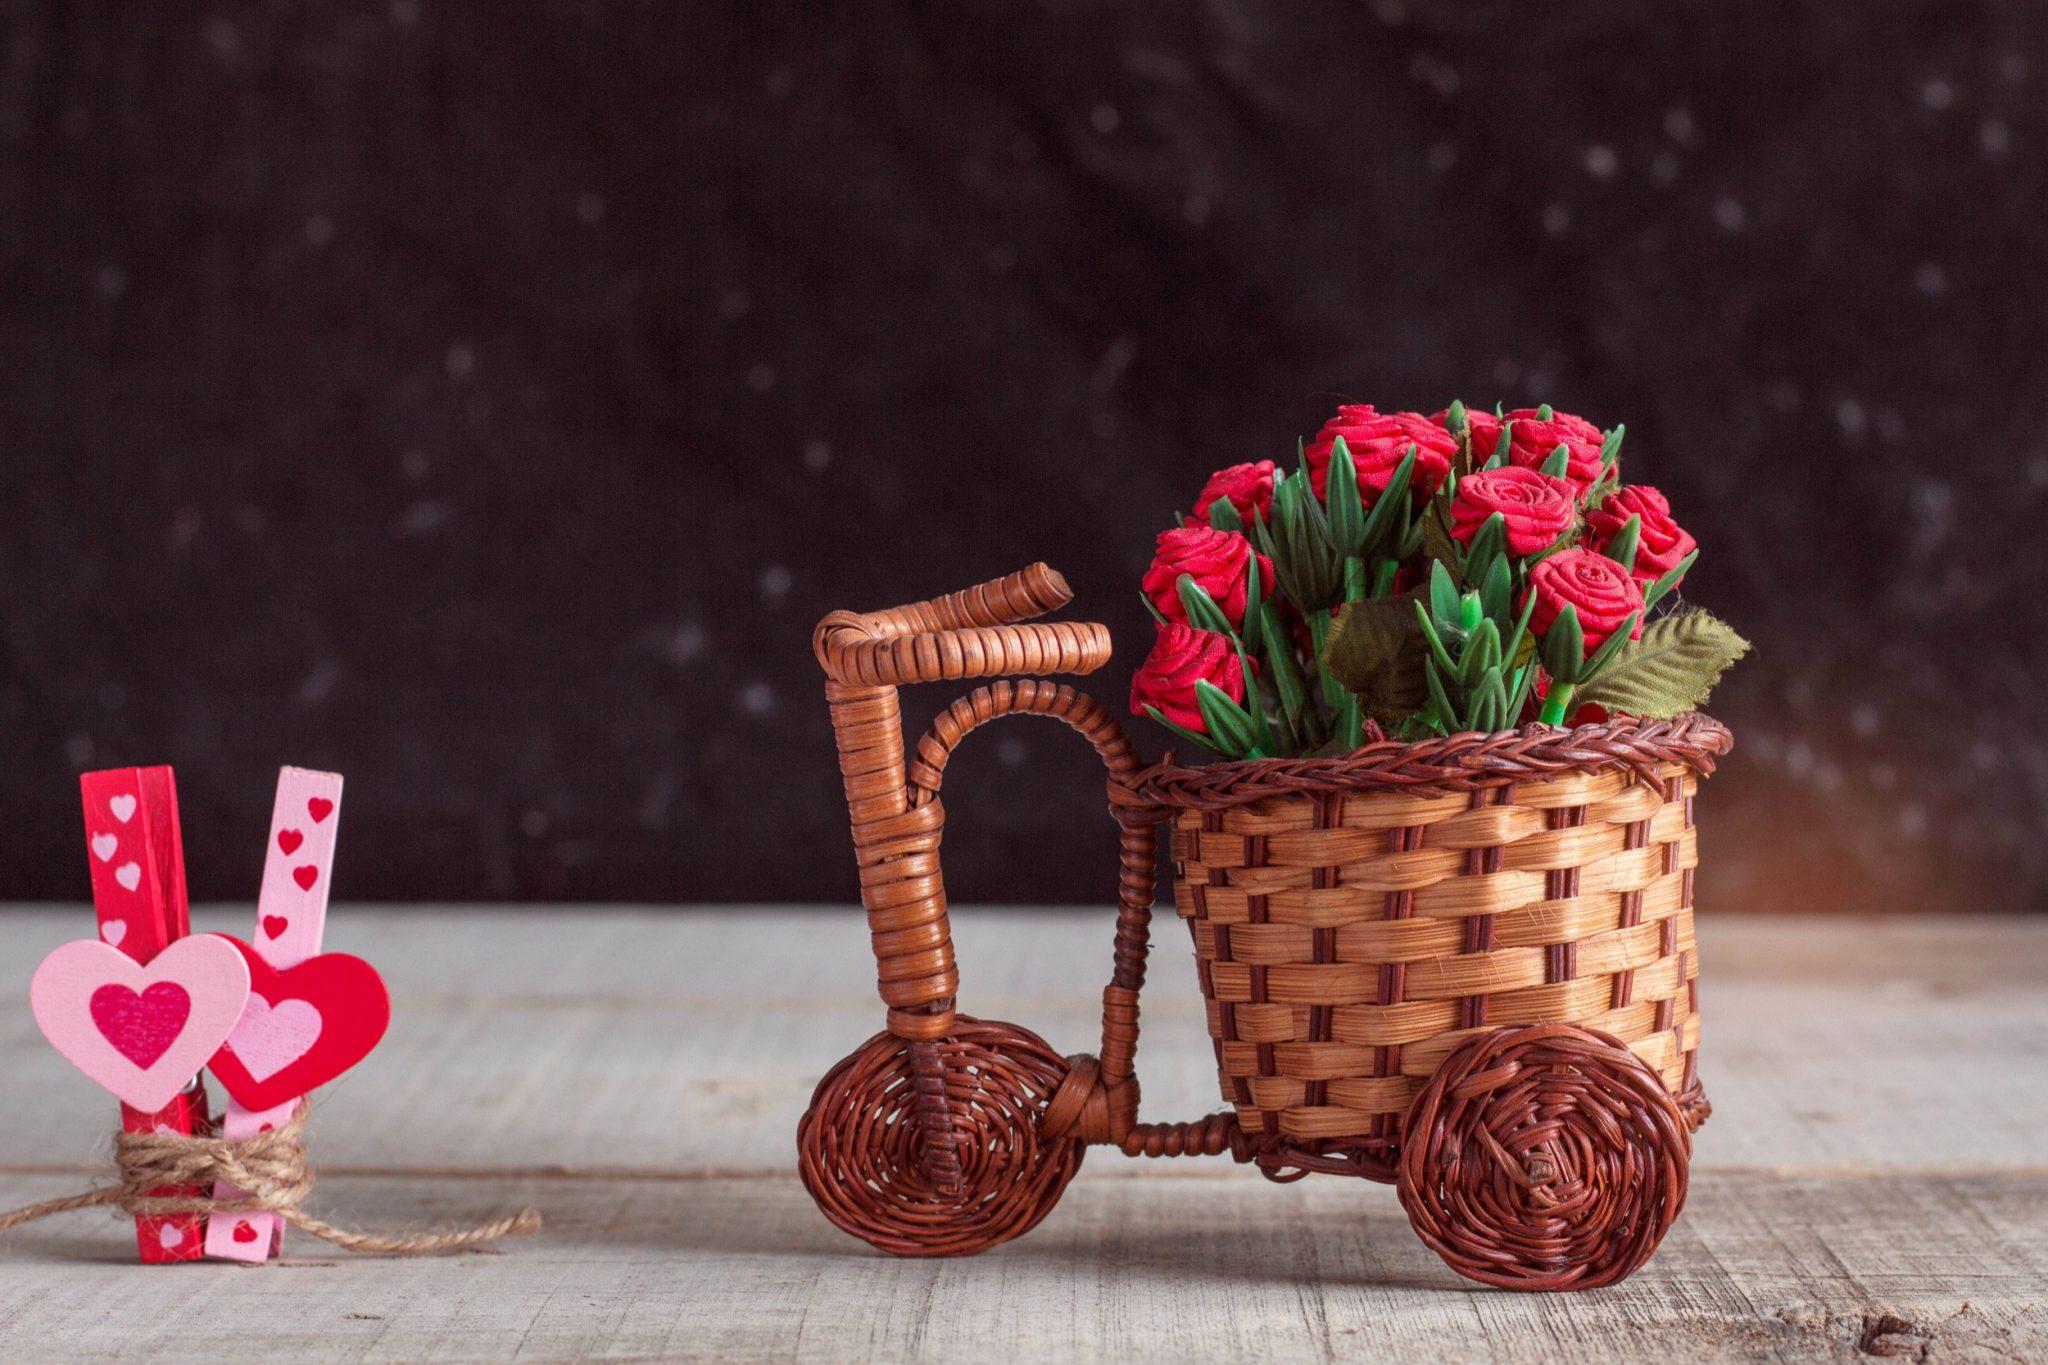 Repurpose Flowerpots and Planters